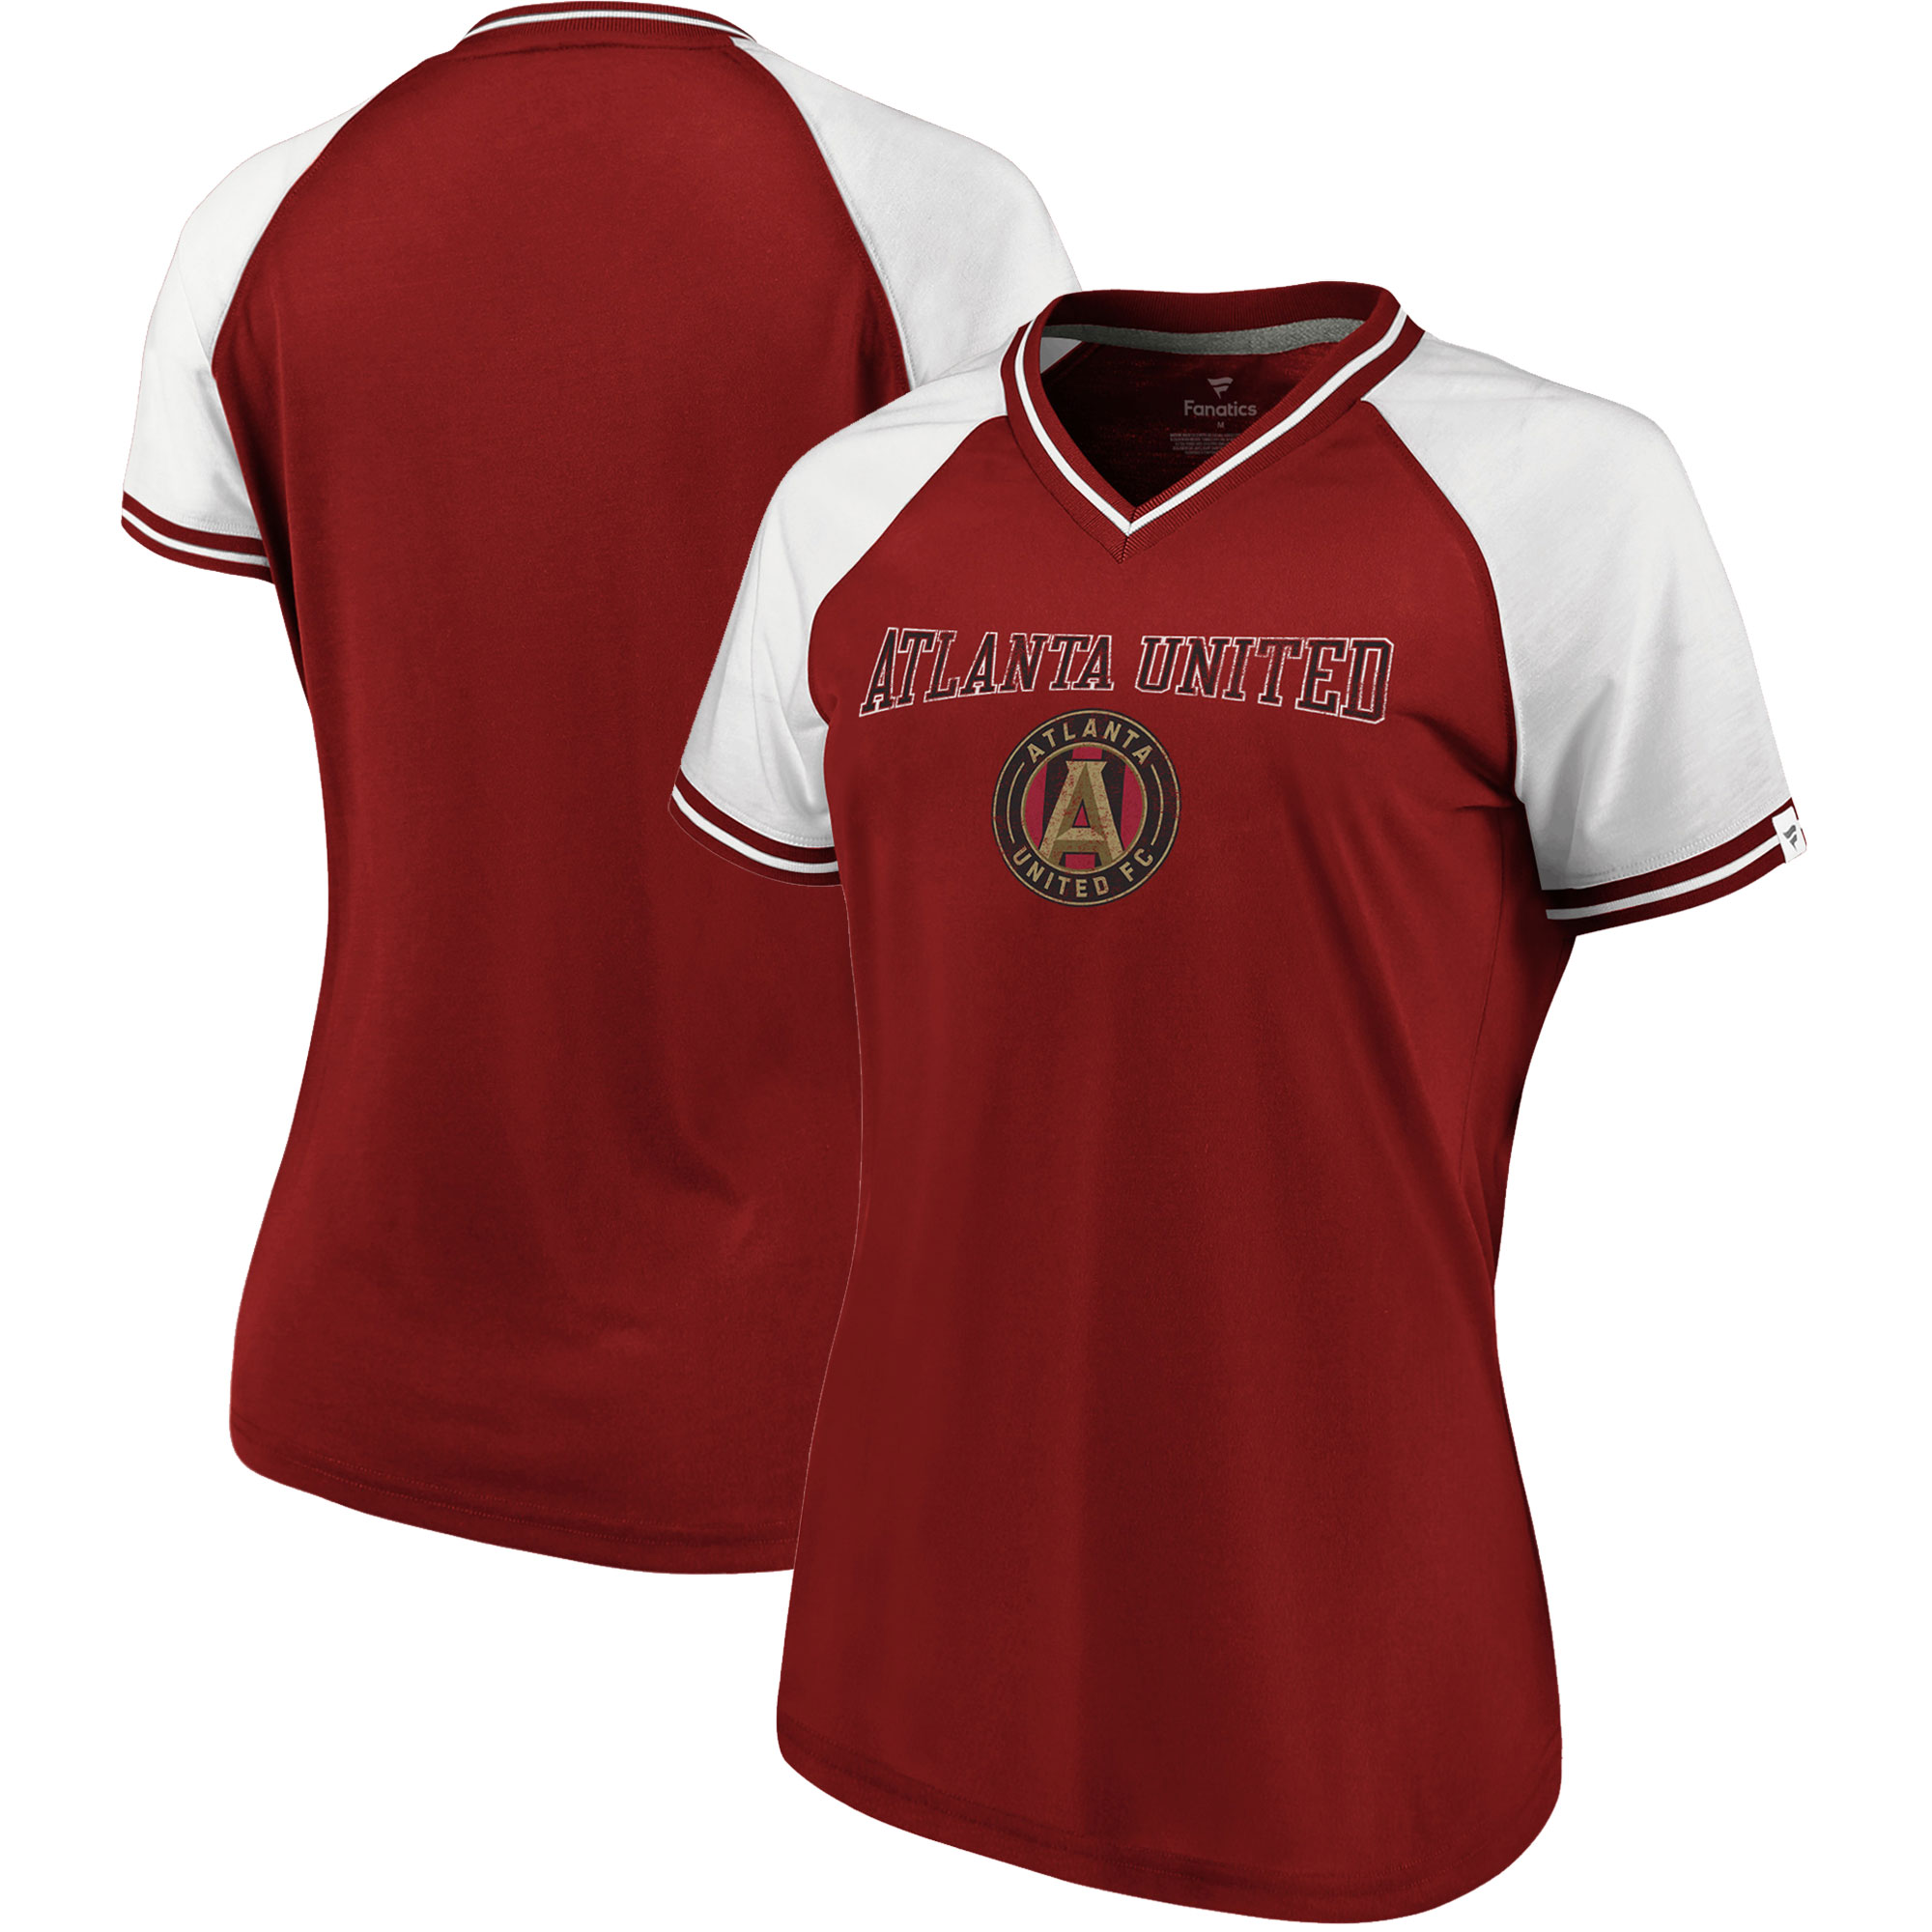 size 40 32045 39a35 Atlanta United FC Fanatics Branded Women's V-Neck T-Shirt ...